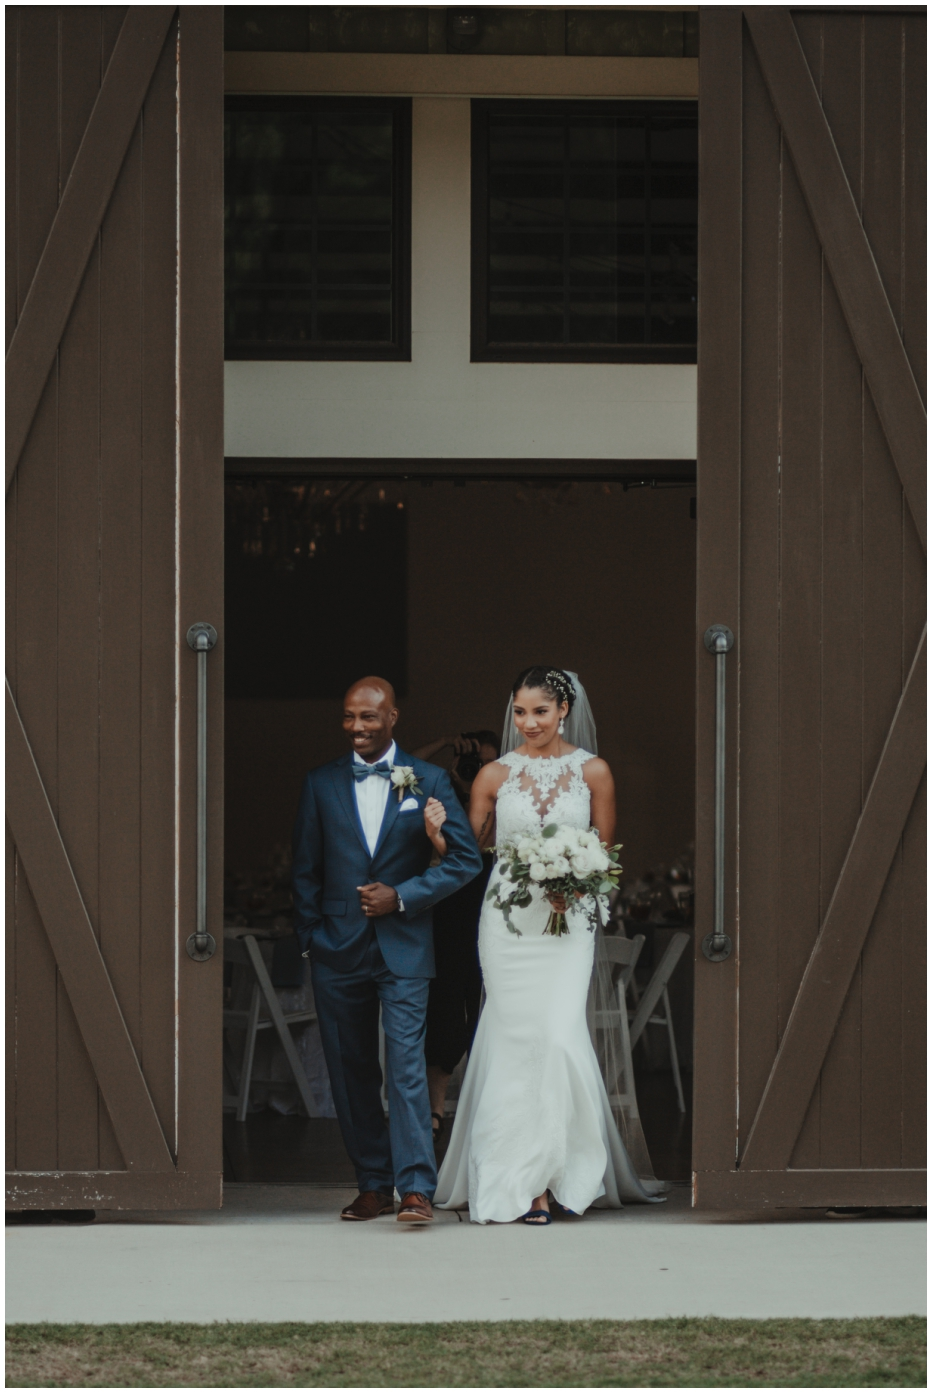 Posh-Moments-Photography-NC- Wedding-Photographer-Rolling-Hills-Farms-Wedding-Monroe-NC-Charlotte-NC_0272.jpg